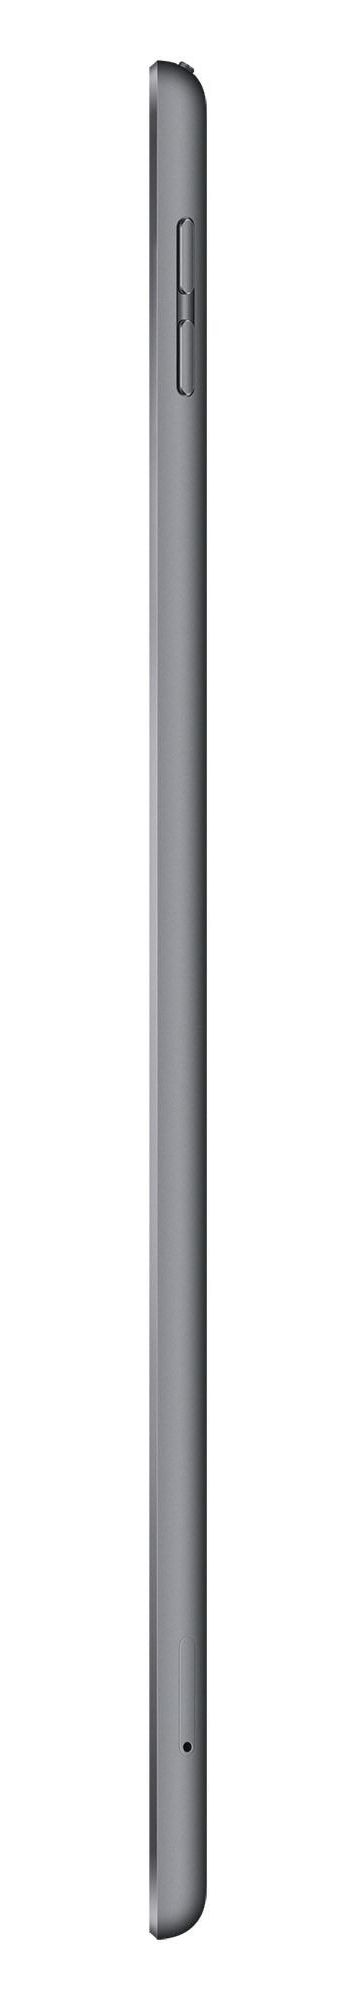 "Таблет Apple iPad 7 Cellular - 10.2"", Space Grey - 4"